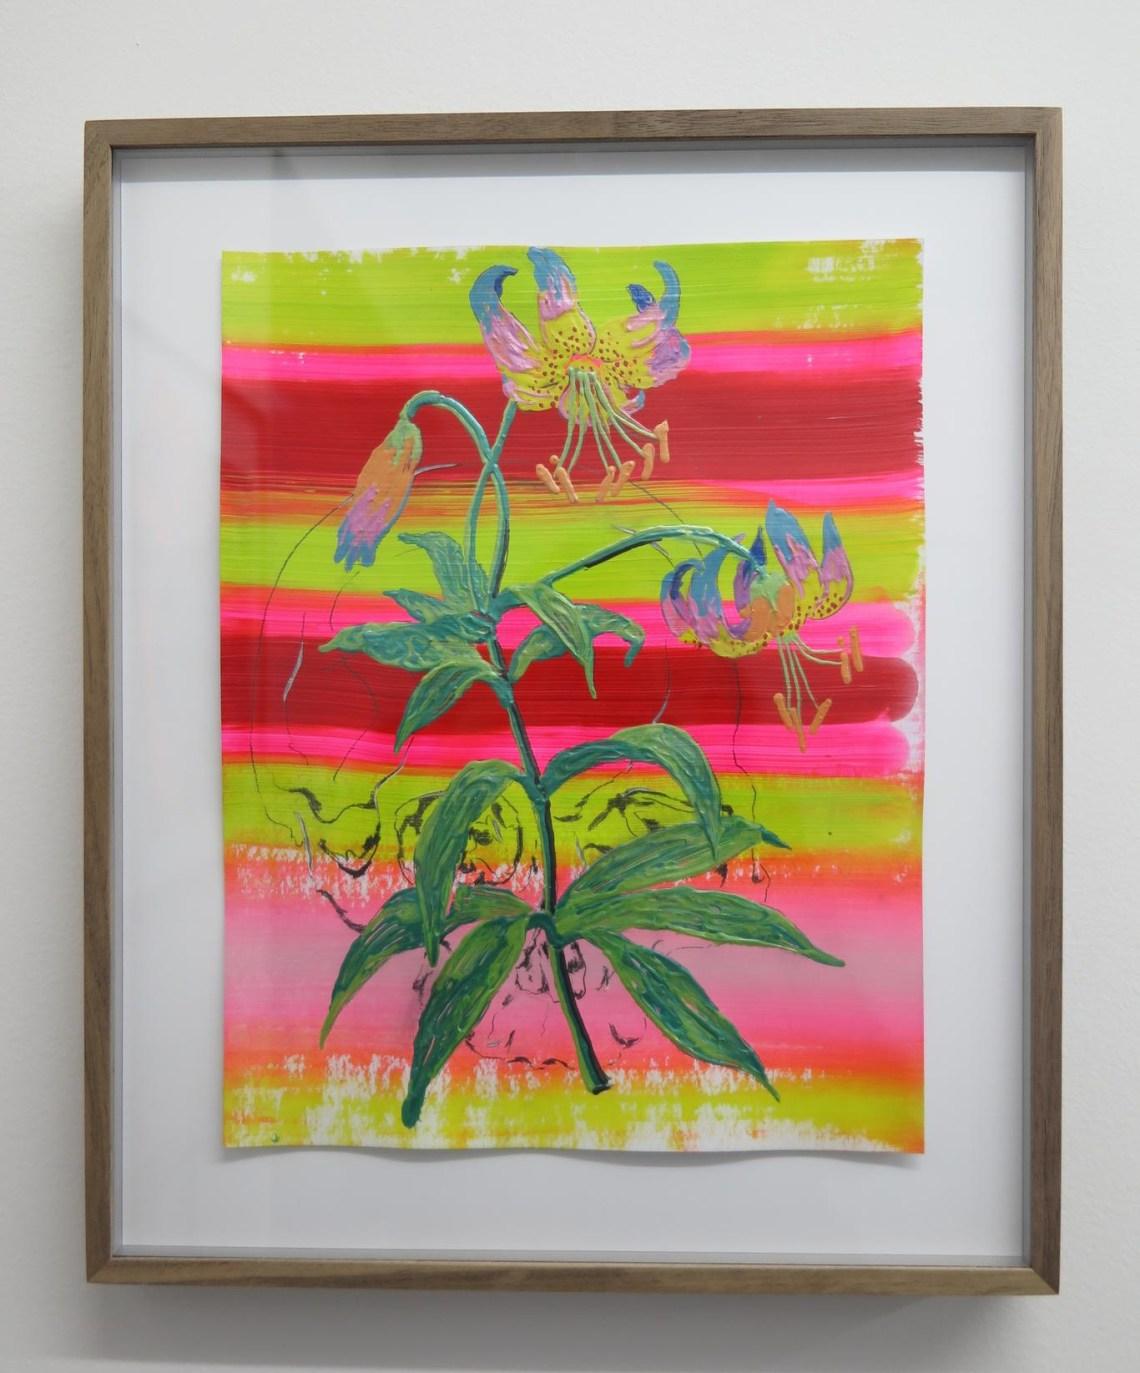 Stefan kasper - Galerie Bart